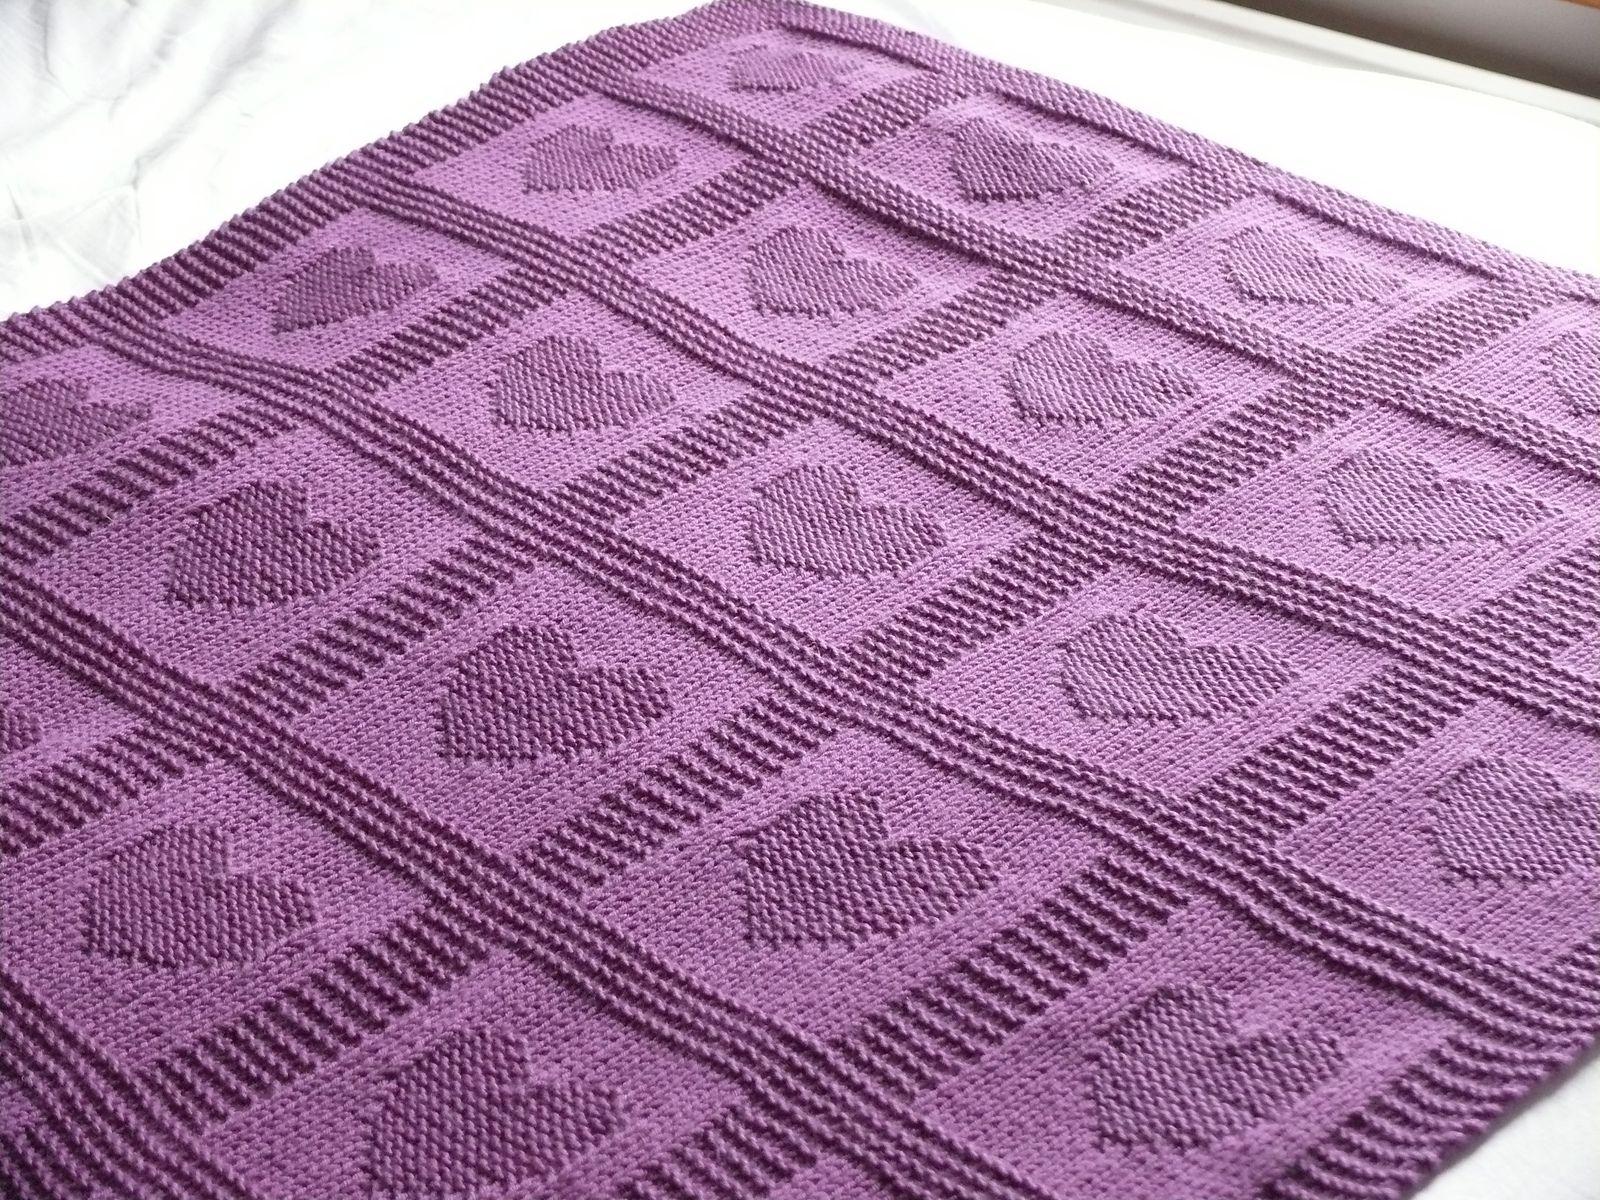 Heart Baby Blanket By Ann Saglimbene - Free Knitted Pattern ...